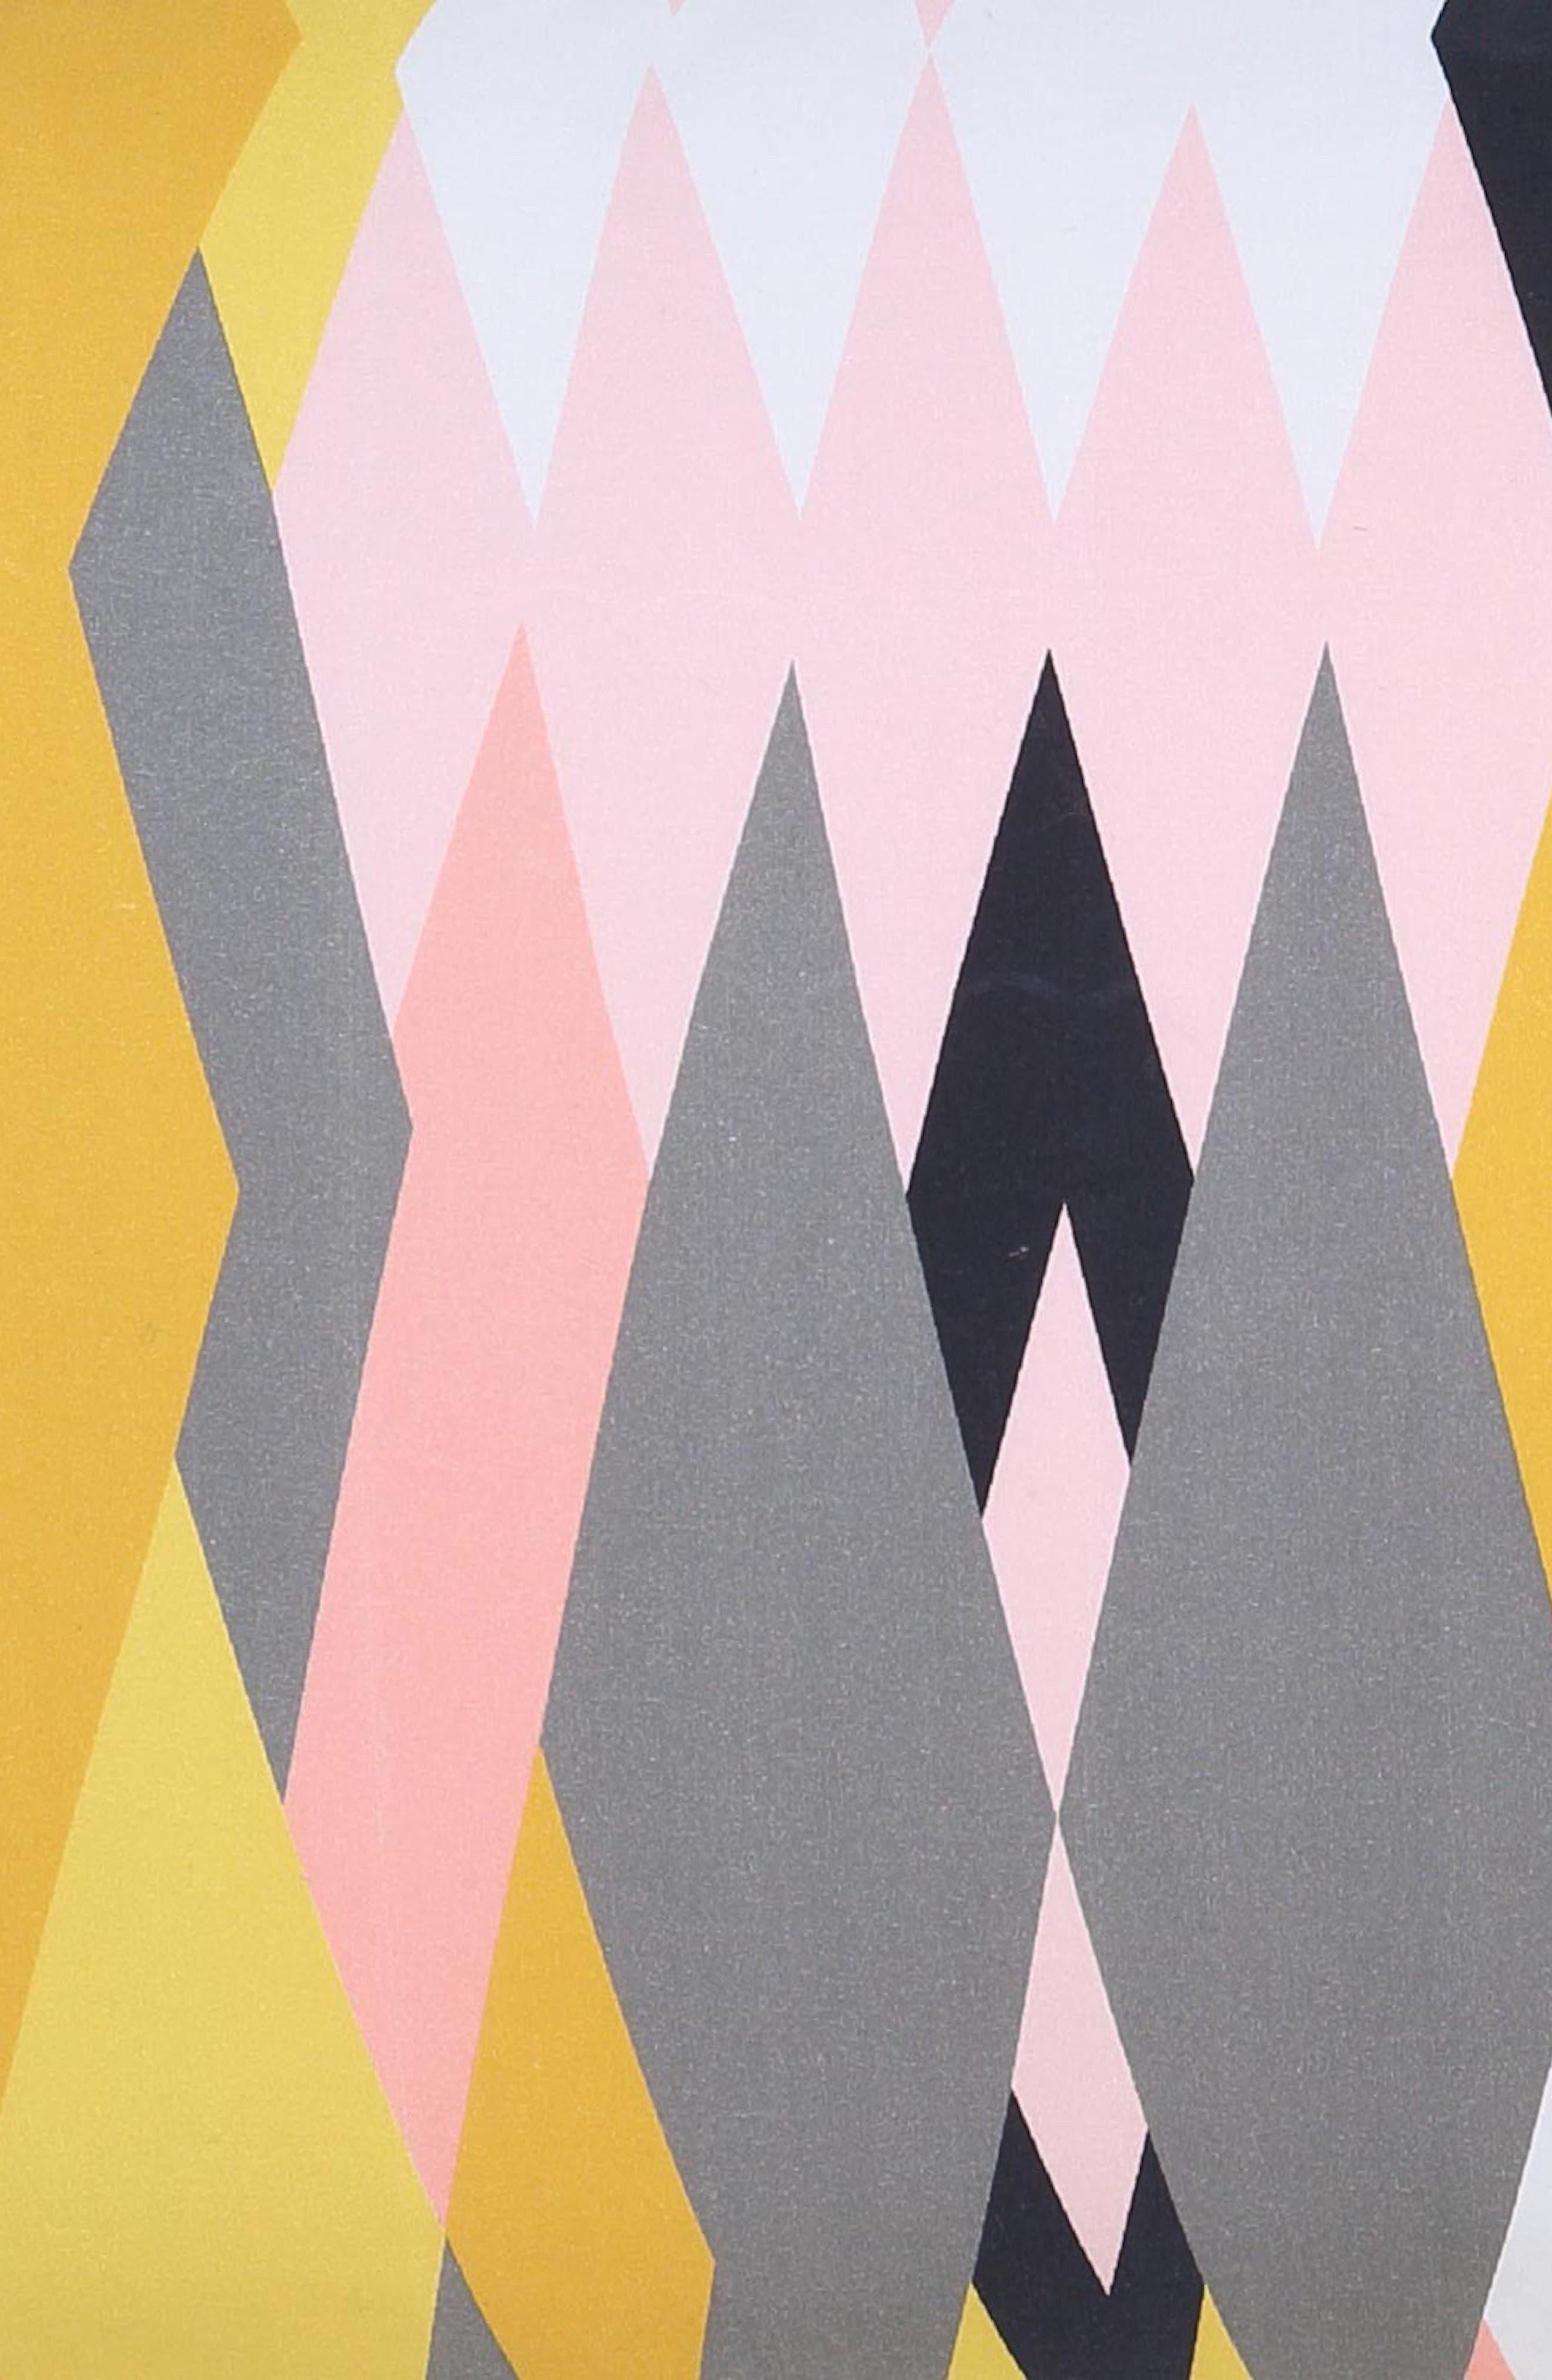 Croc Desert Fitted Cotton Sheet,                             Alternate thumbnail 2, color,                             Multi